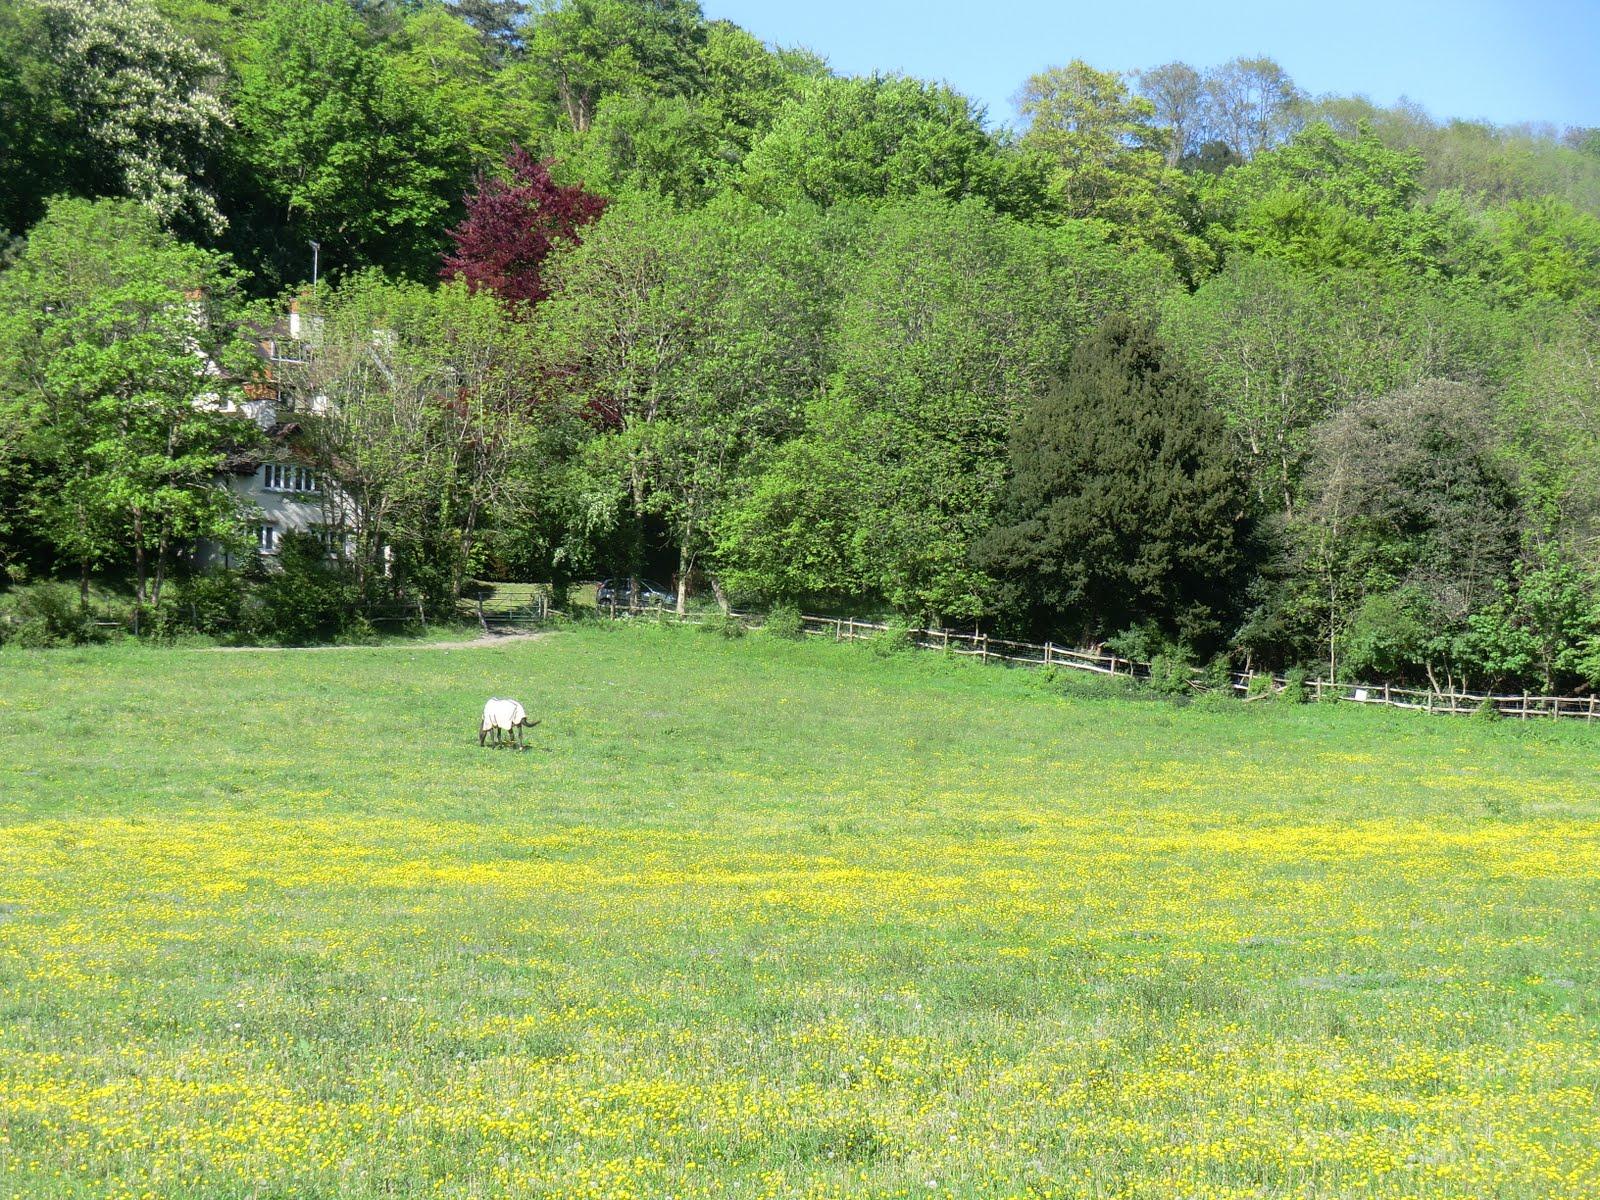 CIMG8169 Meadow near Woldingham station